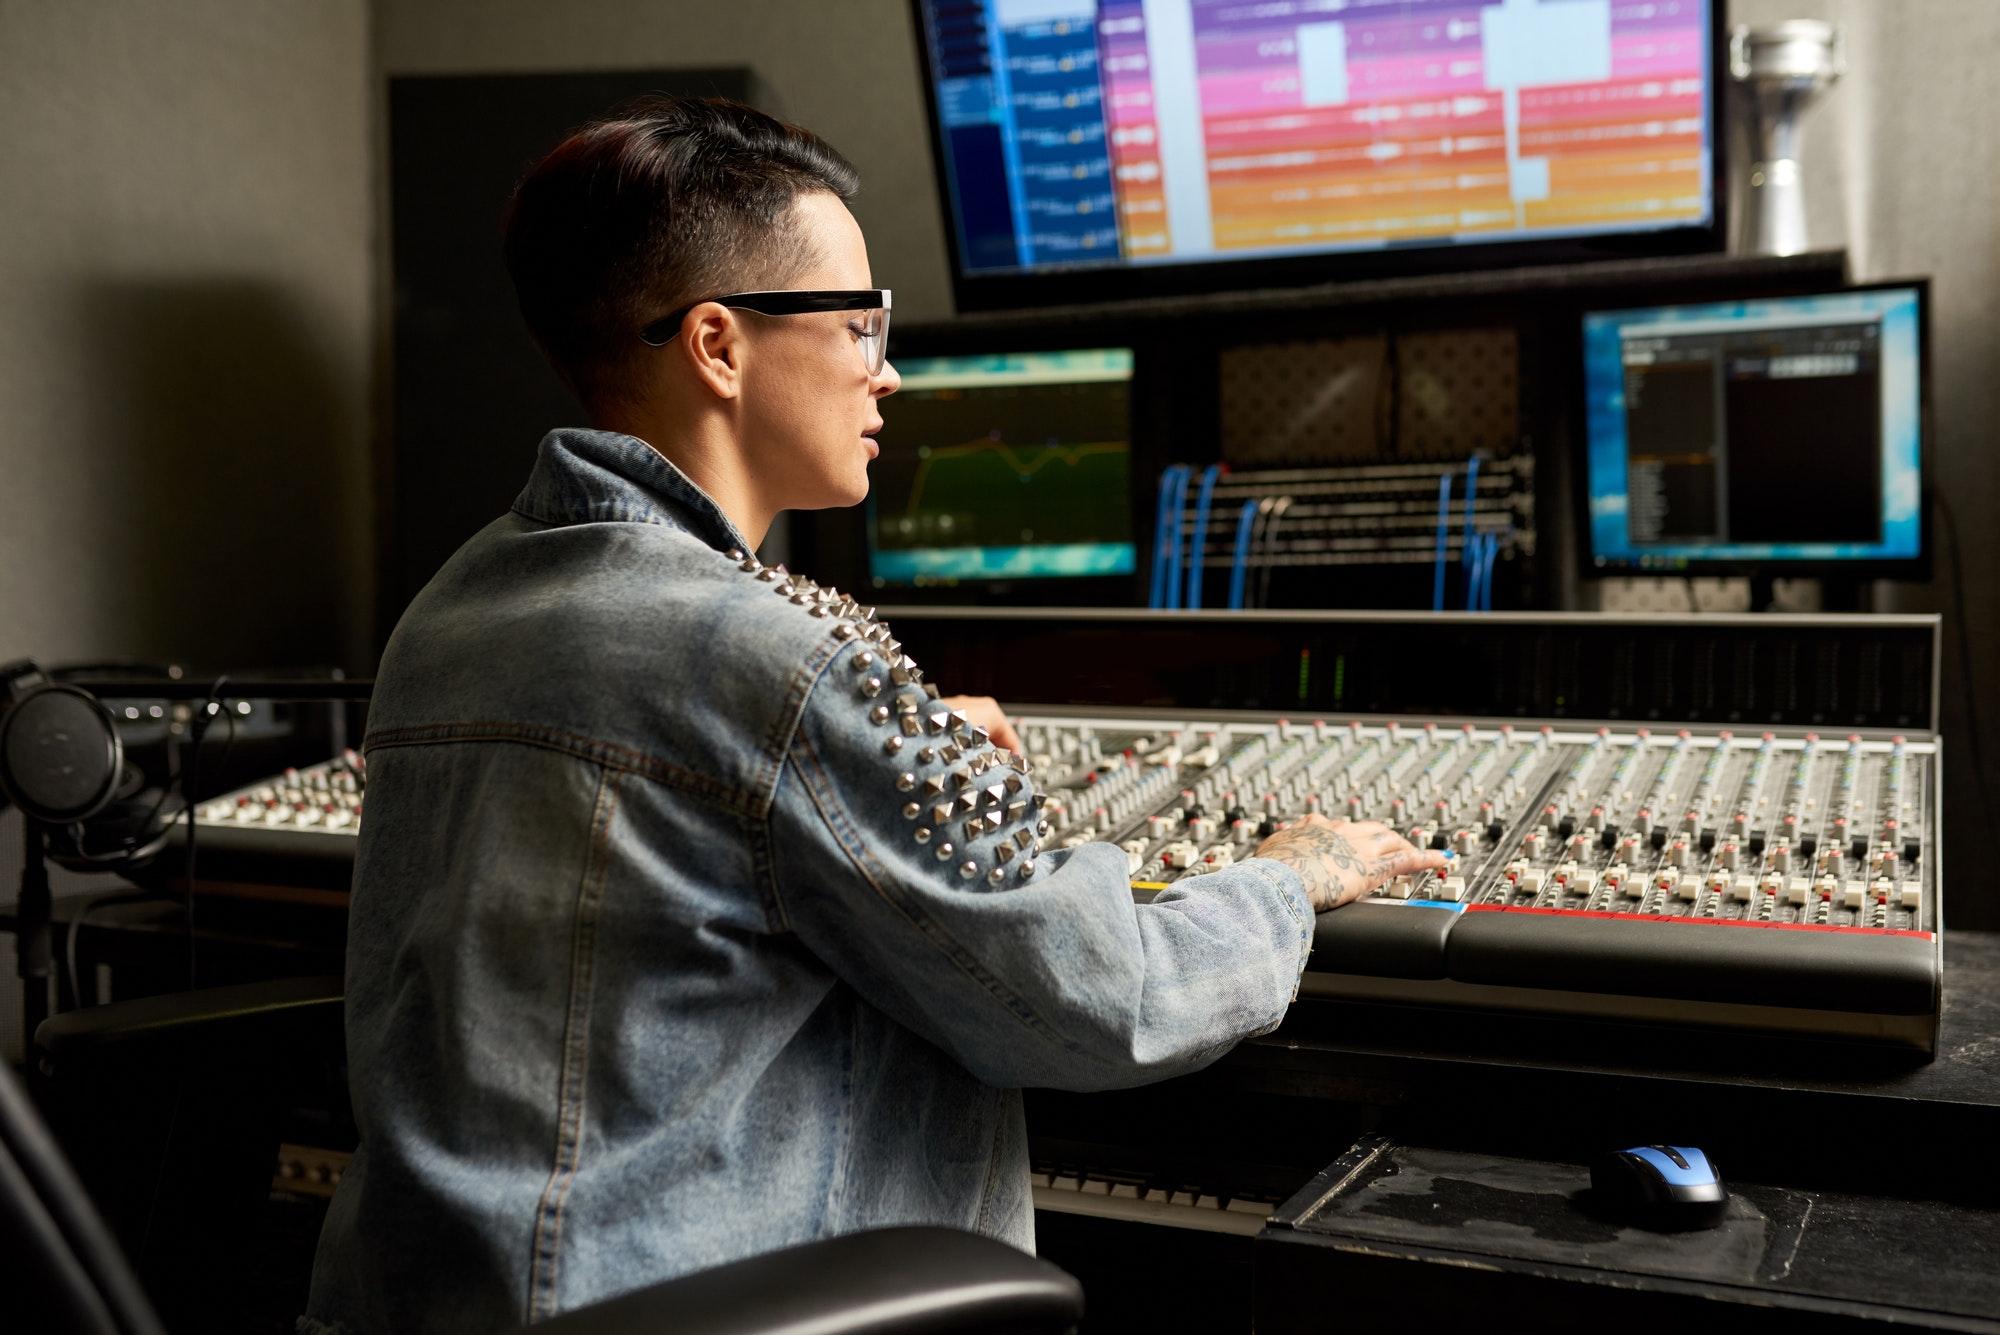 Concentrated audio engineer adjusting mixer in studio